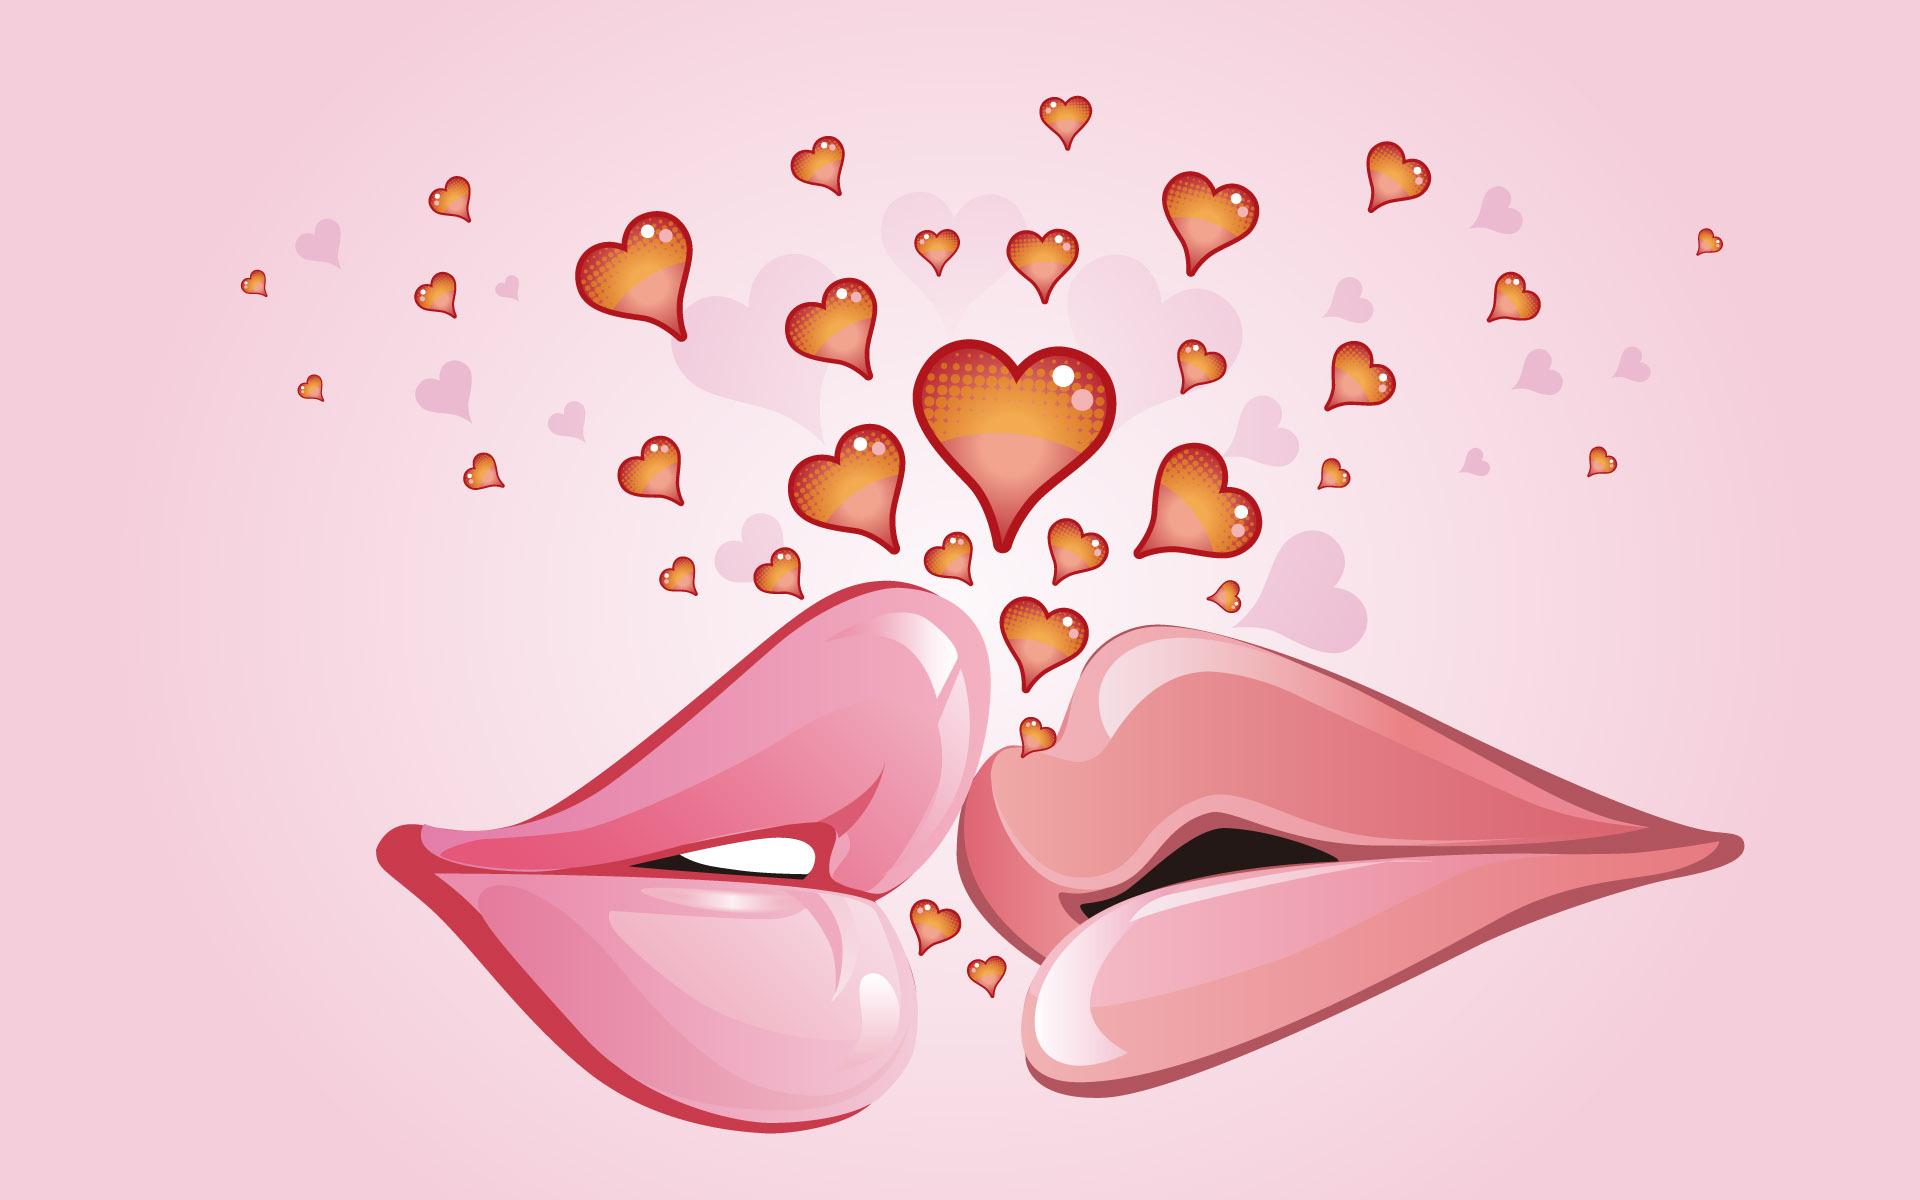 hd wallpapers love kiss